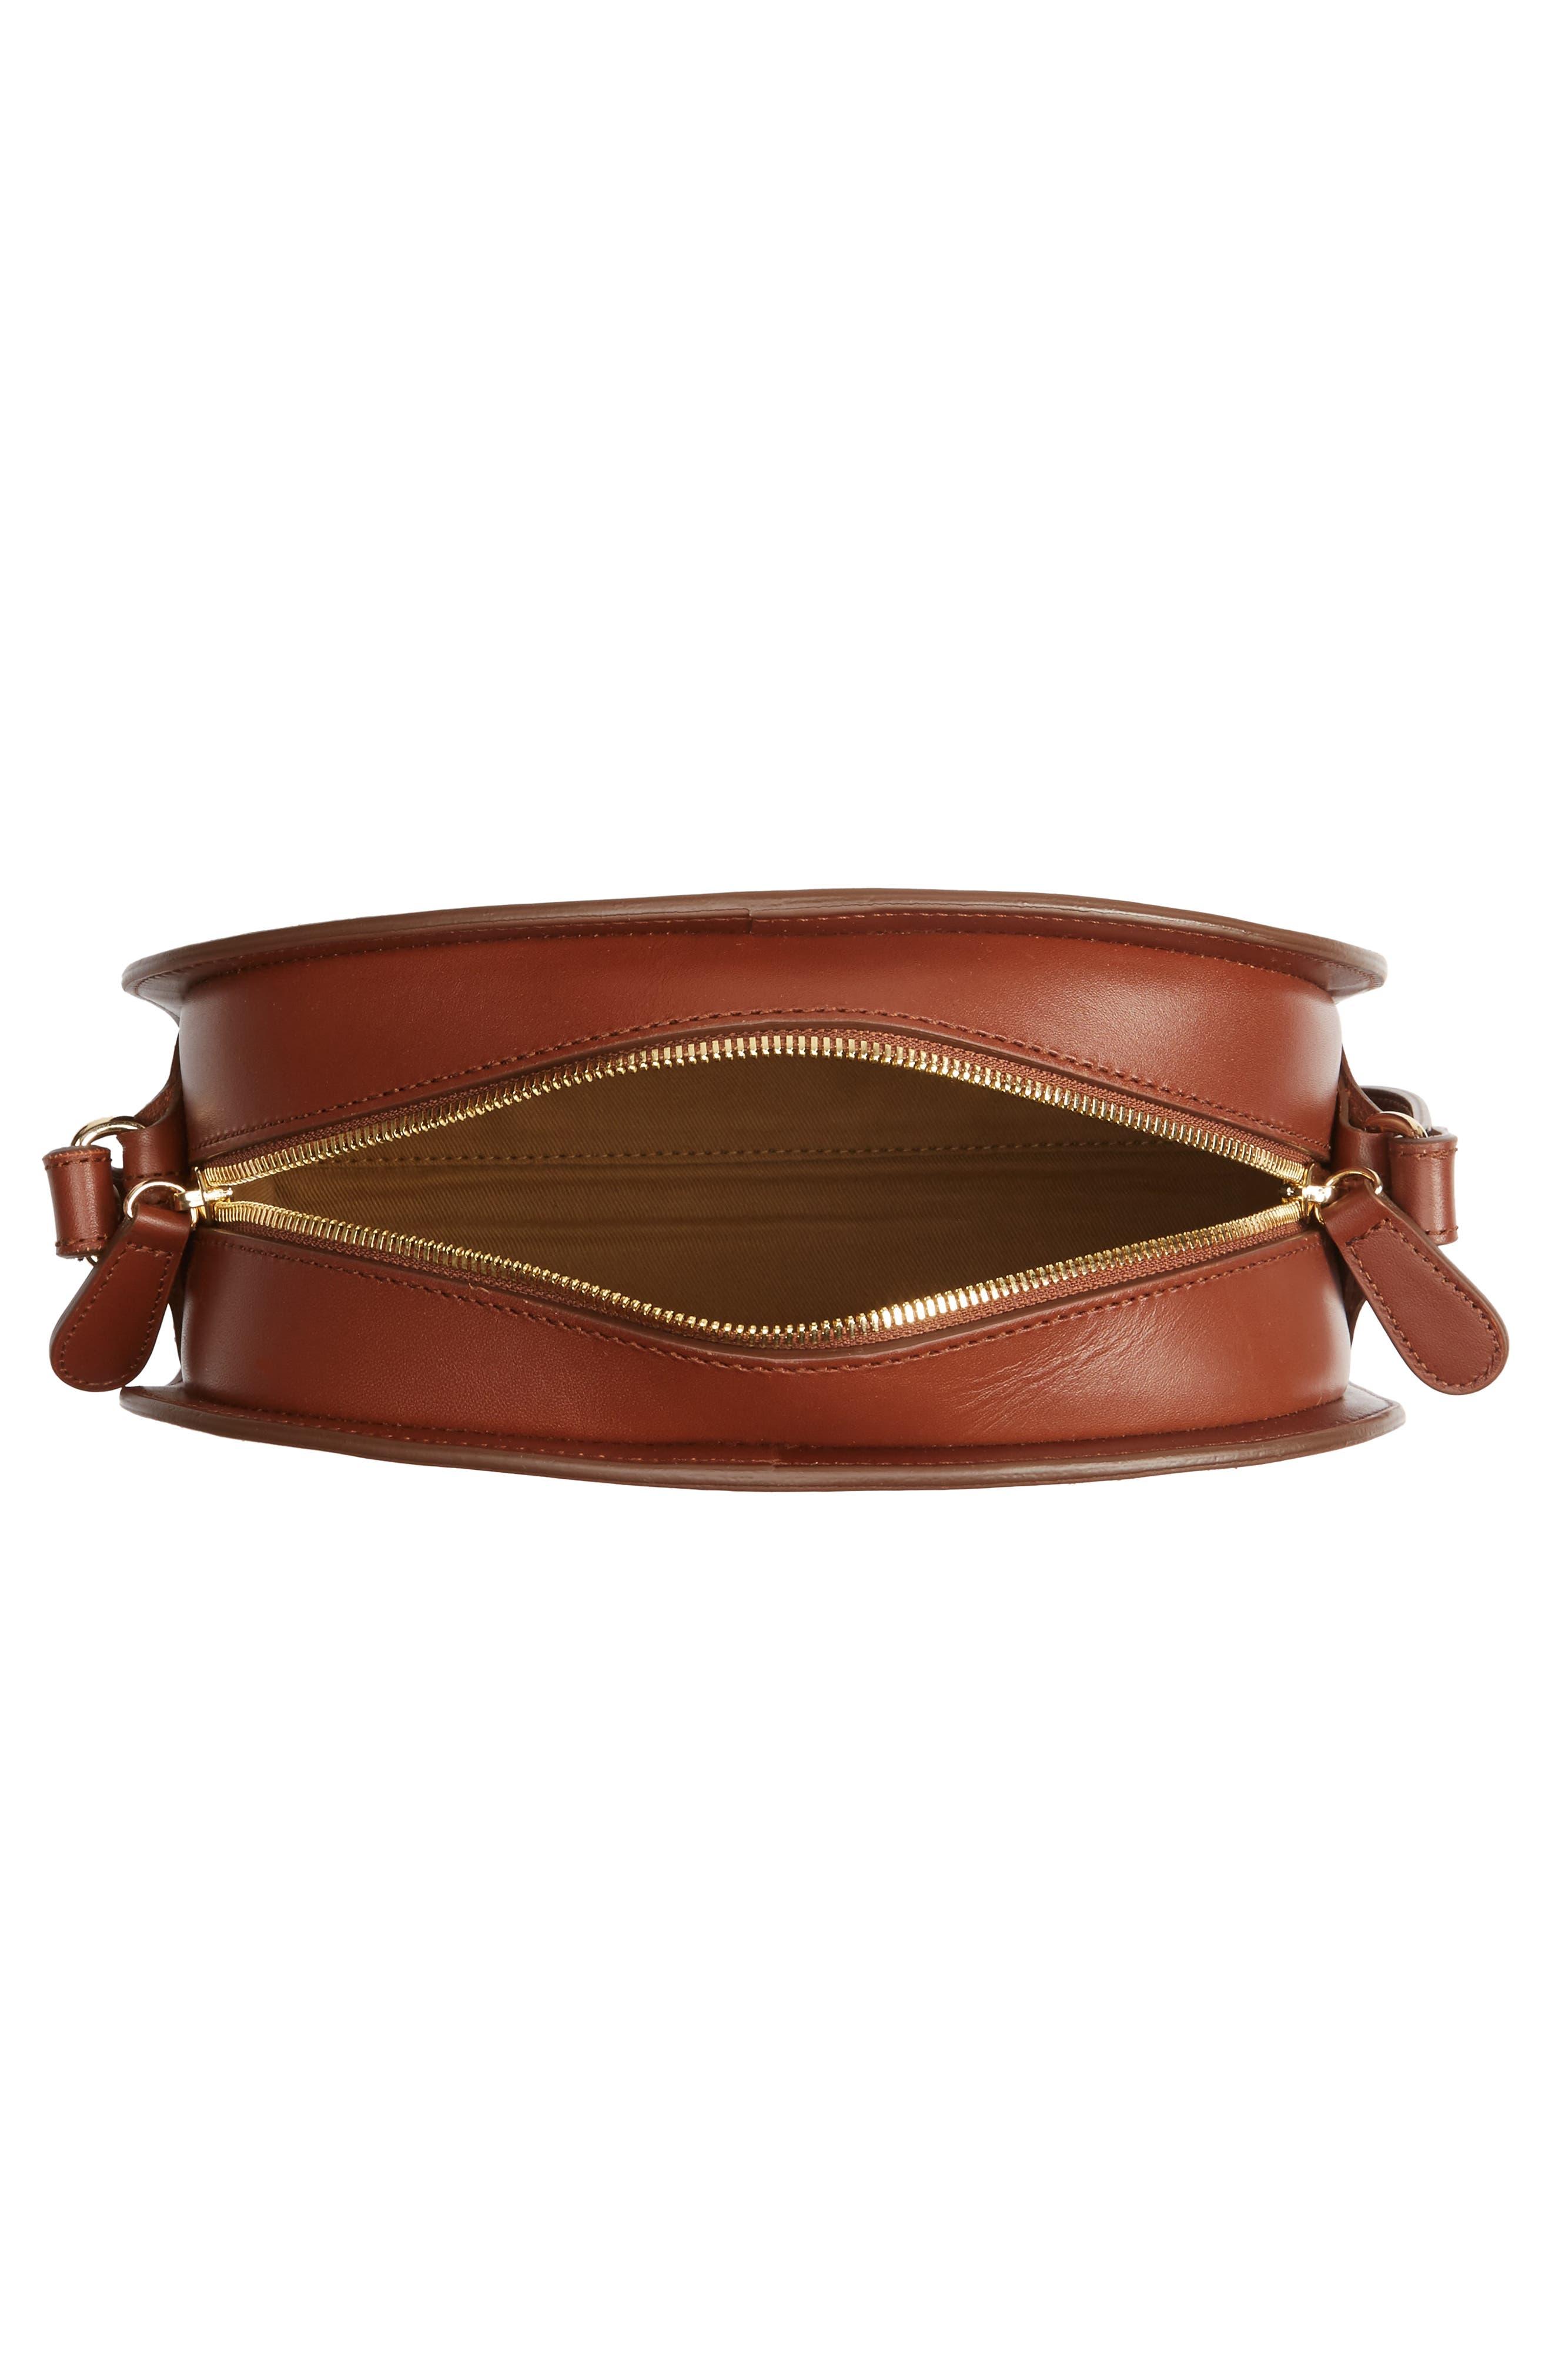 'Sac Demi Lune' Leather Crossbody Bag,                             Alternate thumbnail 4, color,                             NOISETTE